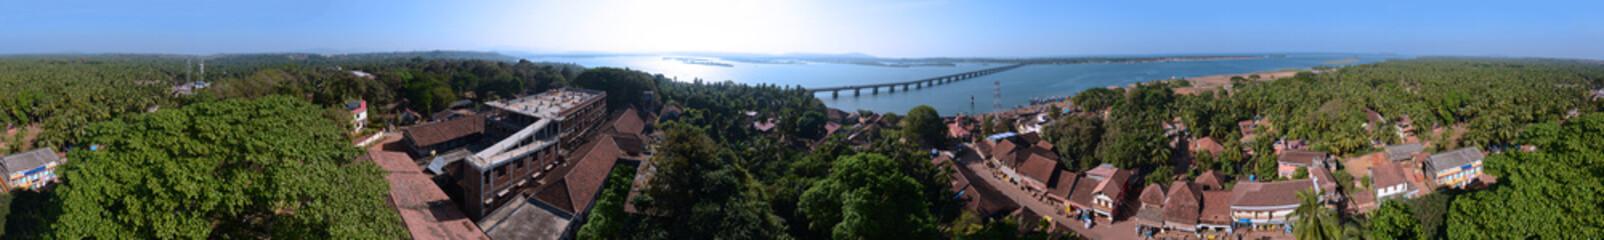 Panorama of a typical Indian coastal town Honnavar, Karnataka